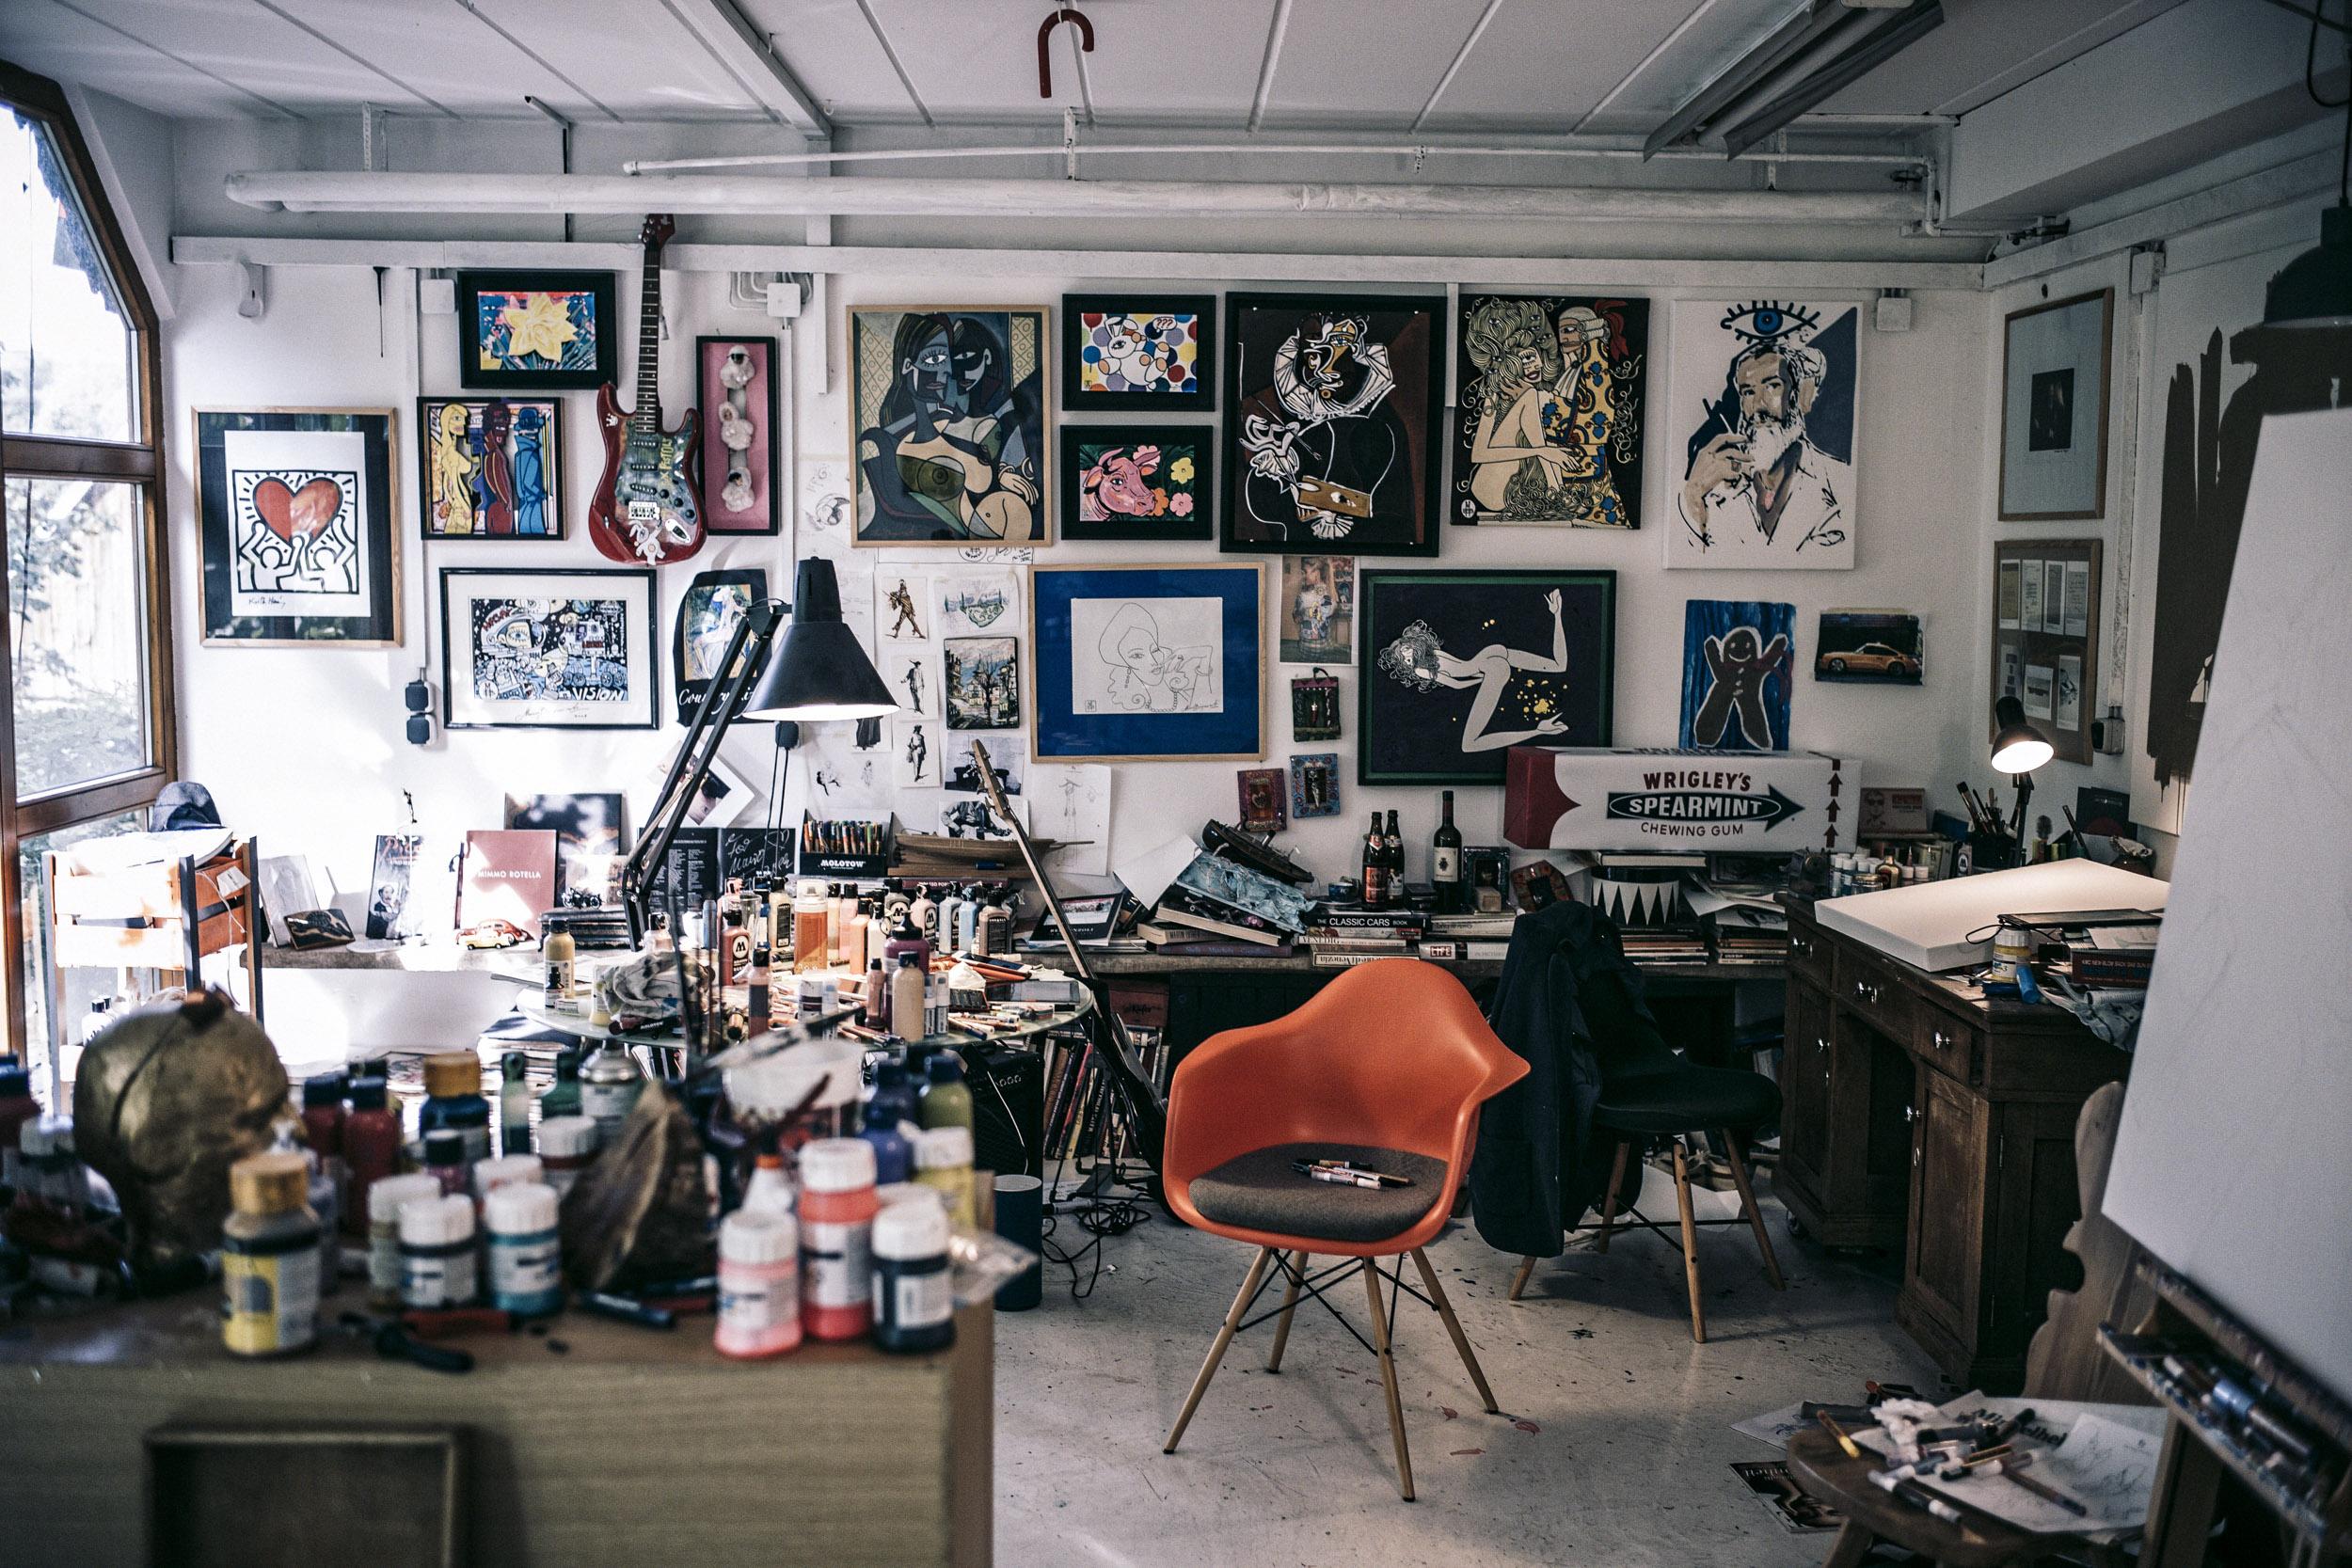 2018-SeifertUebler-Mauro-Bergonzoli-lifestyle-portrait-artist-photography-005.jpg